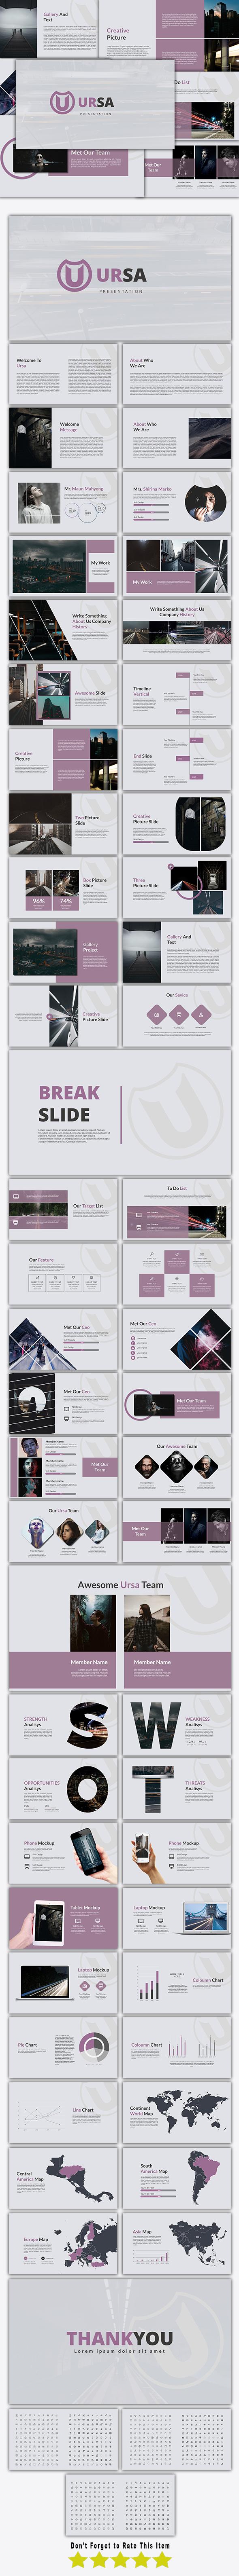 Ursa - Powerpoint Template - PowerPoint Templates Presentation Templates